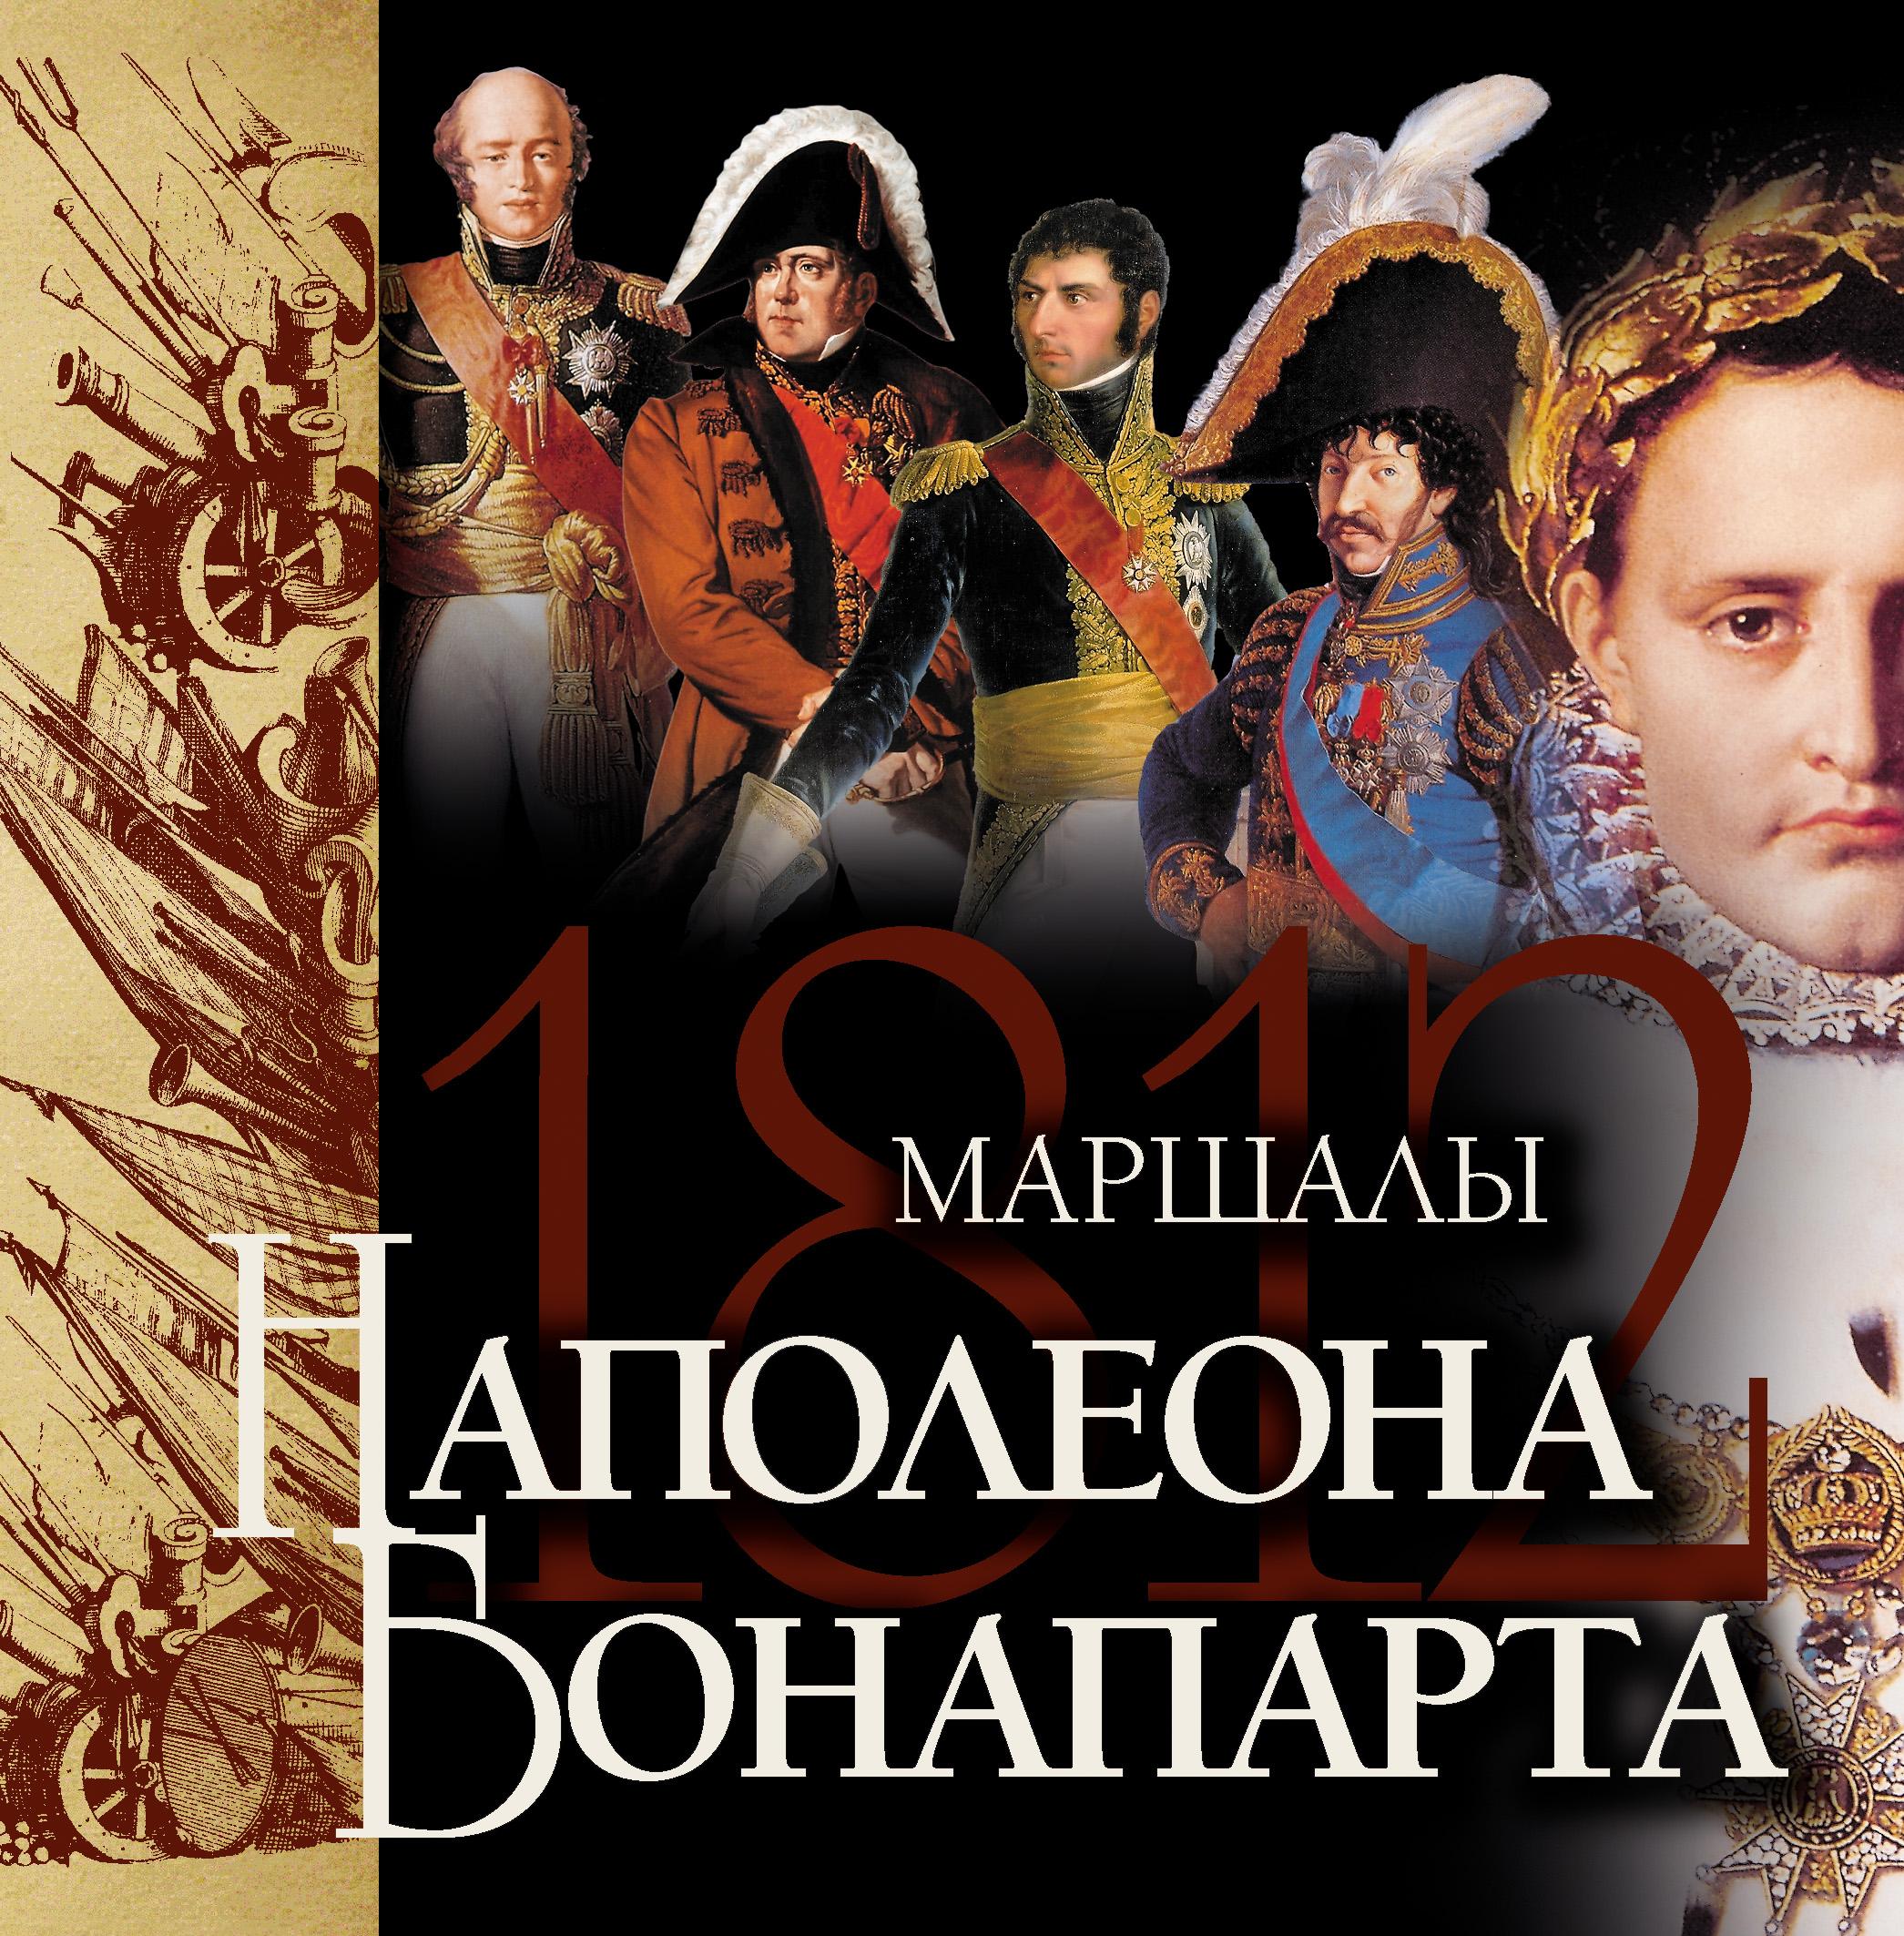 Яков Нерсесов Маршалы Наполеона Бонапарта цены онлайн